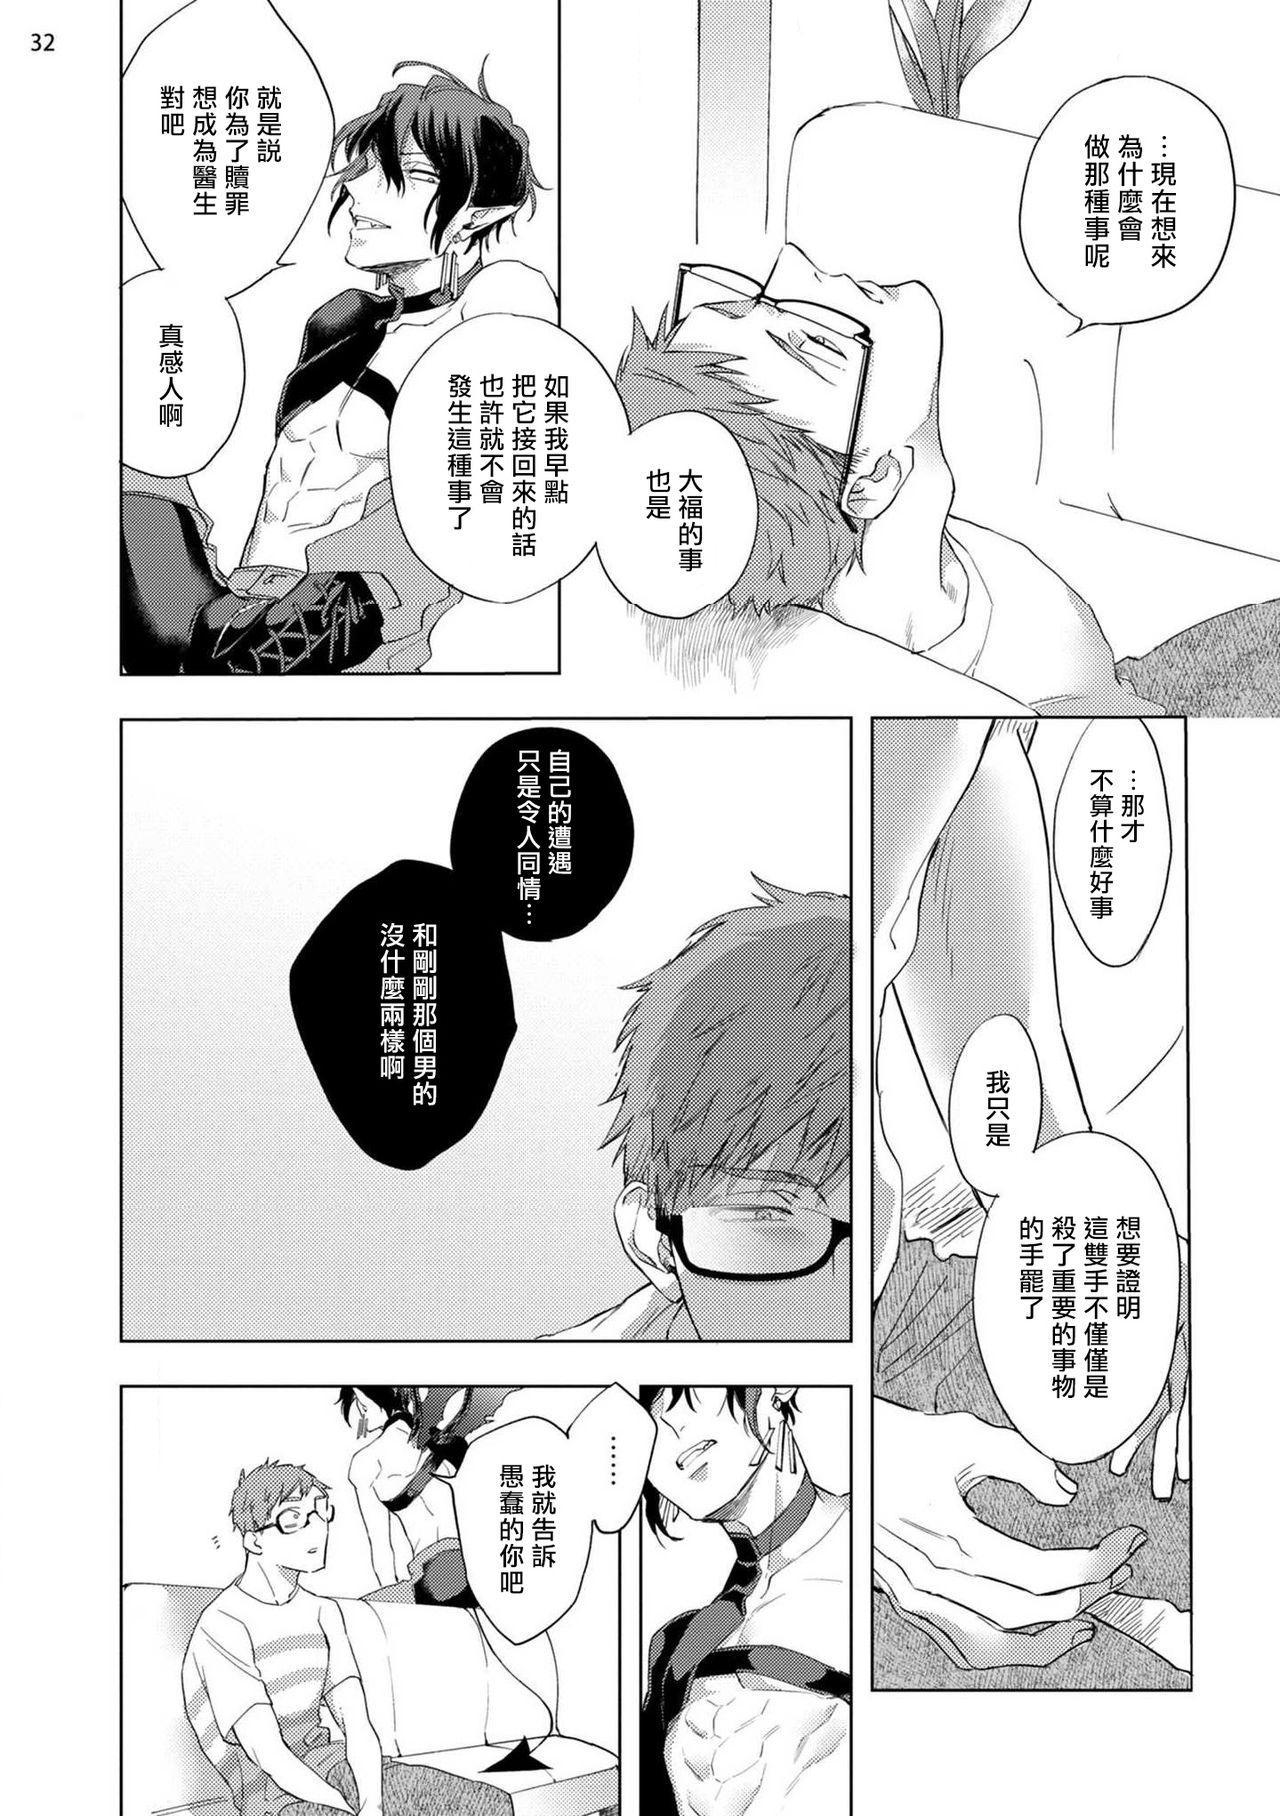 [Yao] Inma-sama ni Hallelujah!   赞美淫魔大人! Ch. 1-3 [Chinese] [拾荒者汉化组] [Digital] 102